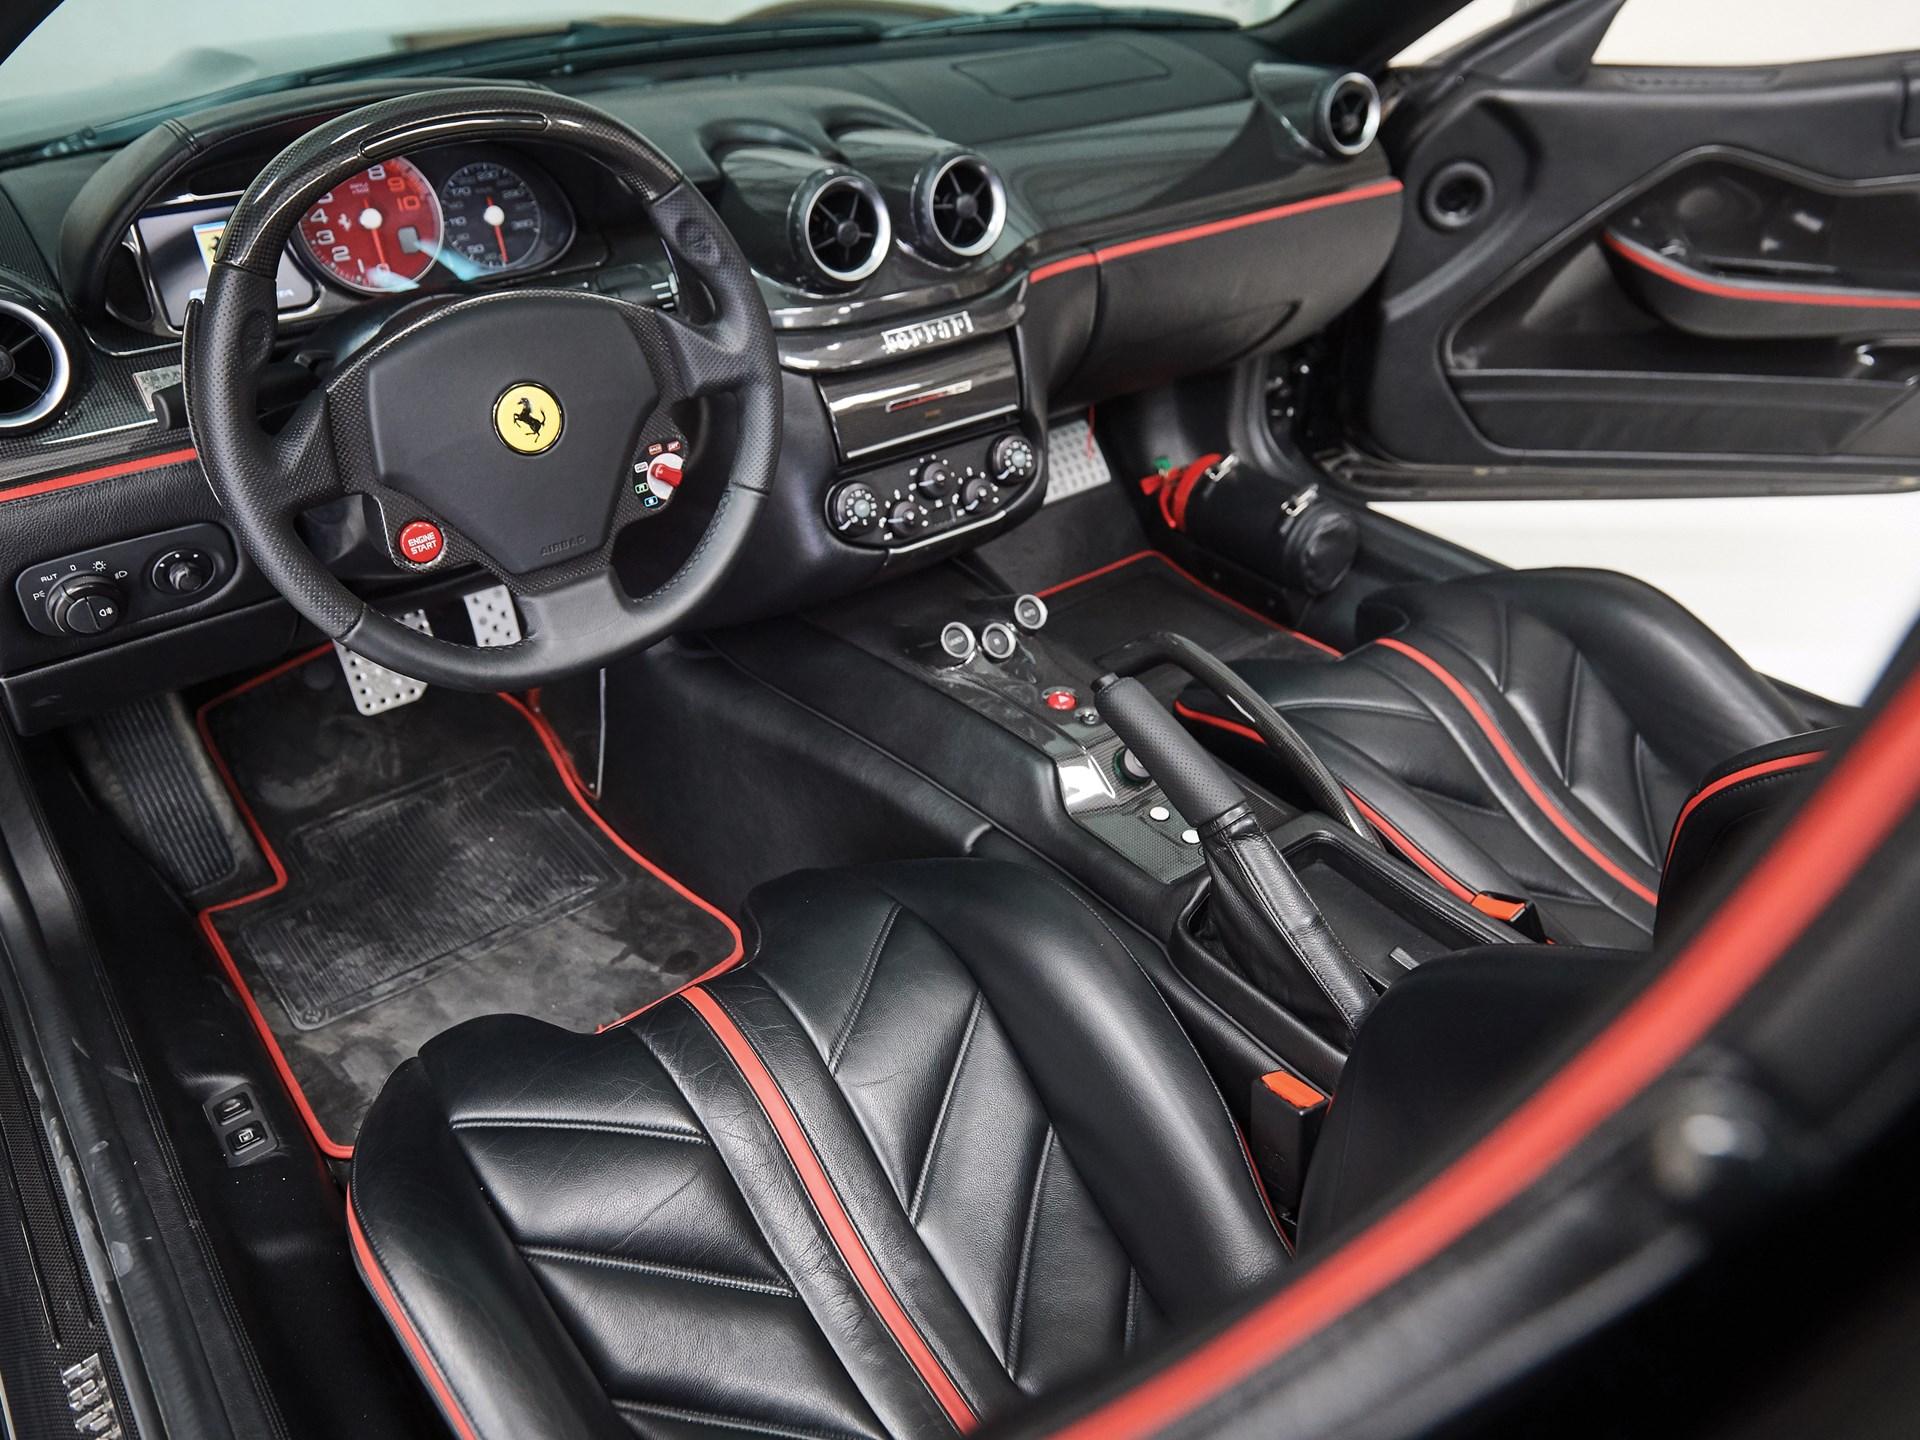 Rm Sotheby S 2011 Ferrari 599 Sa Aperta Paris 2019